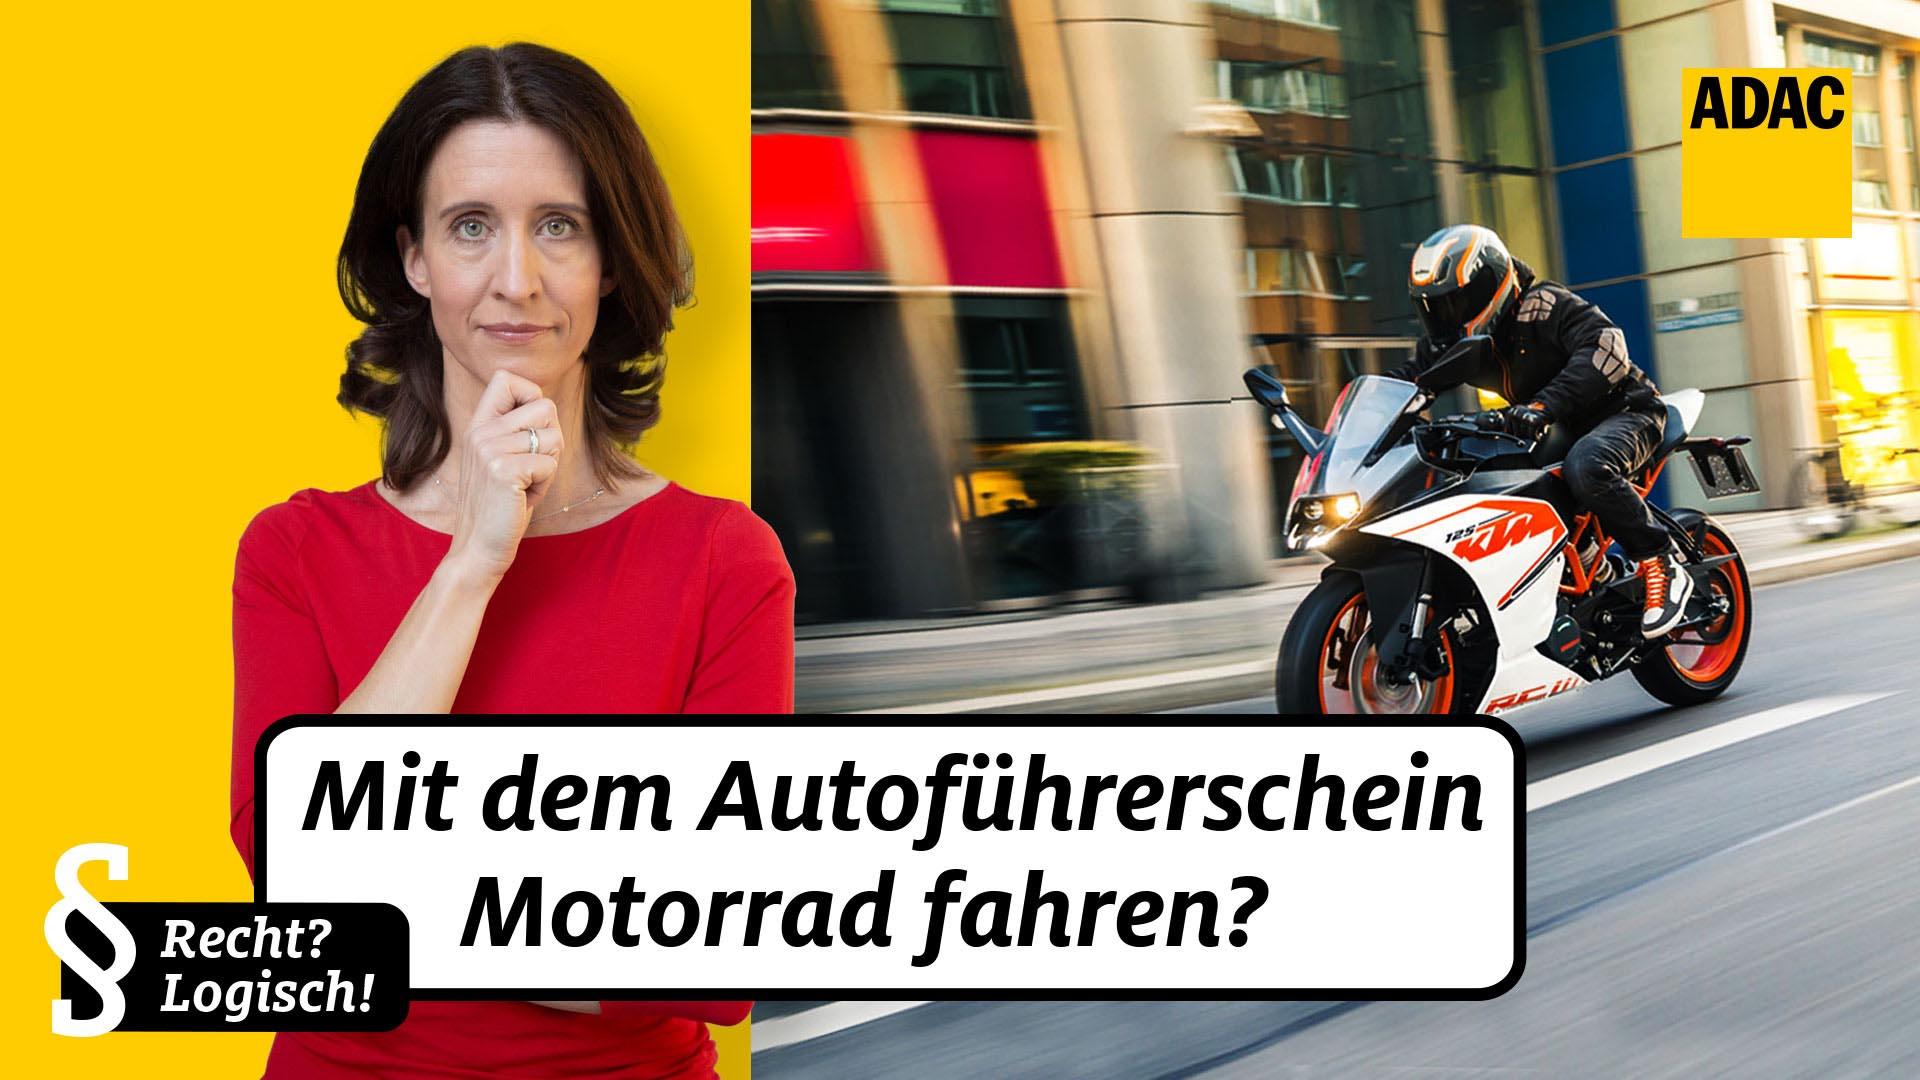 Ab Wieviel Jahren Darf Man Motorrad Fahren - srikani goja